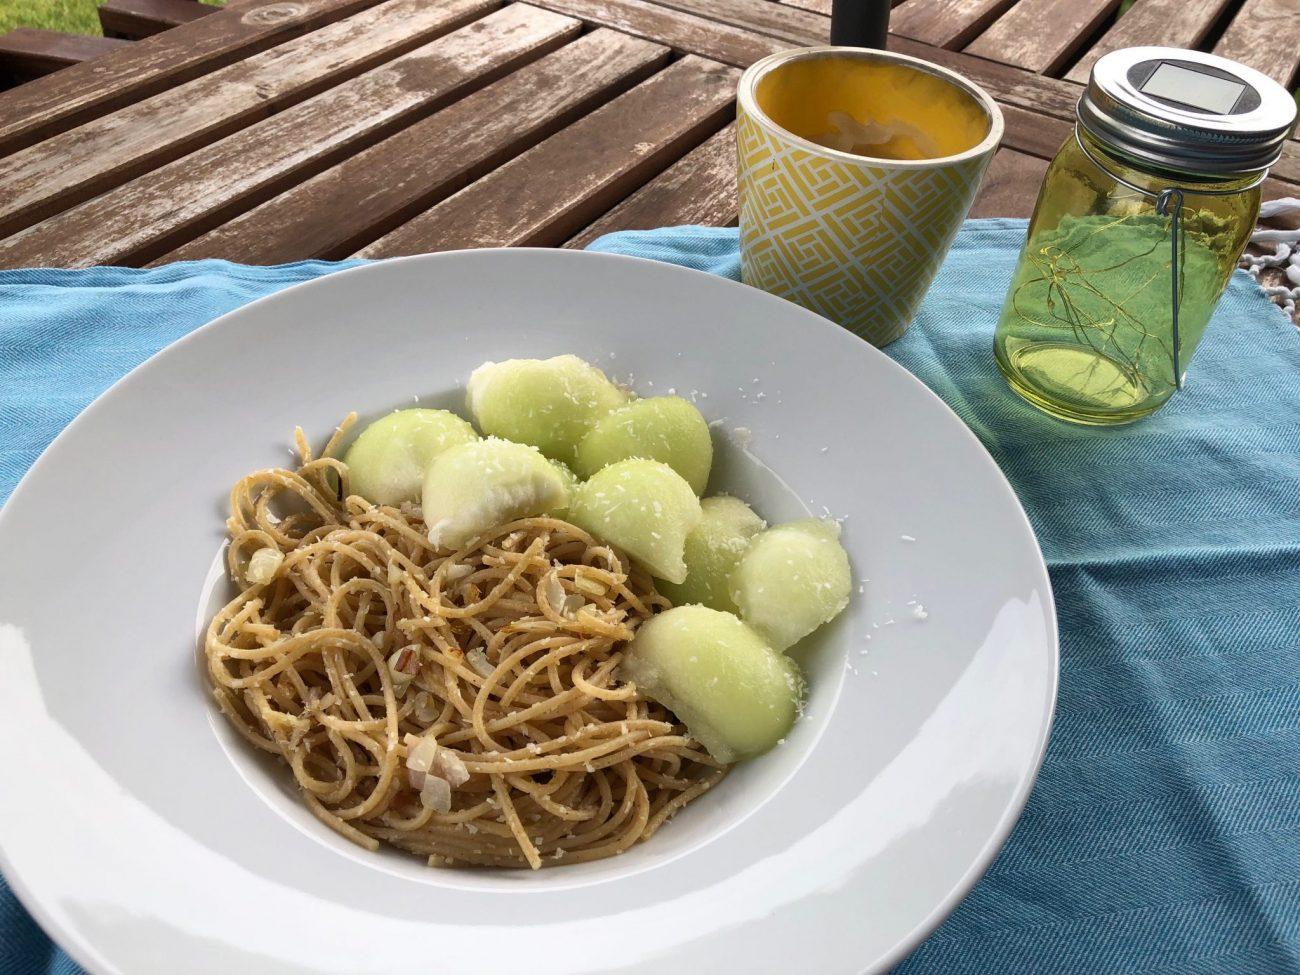 Gebratene Nudeln mit Melonenkugeln